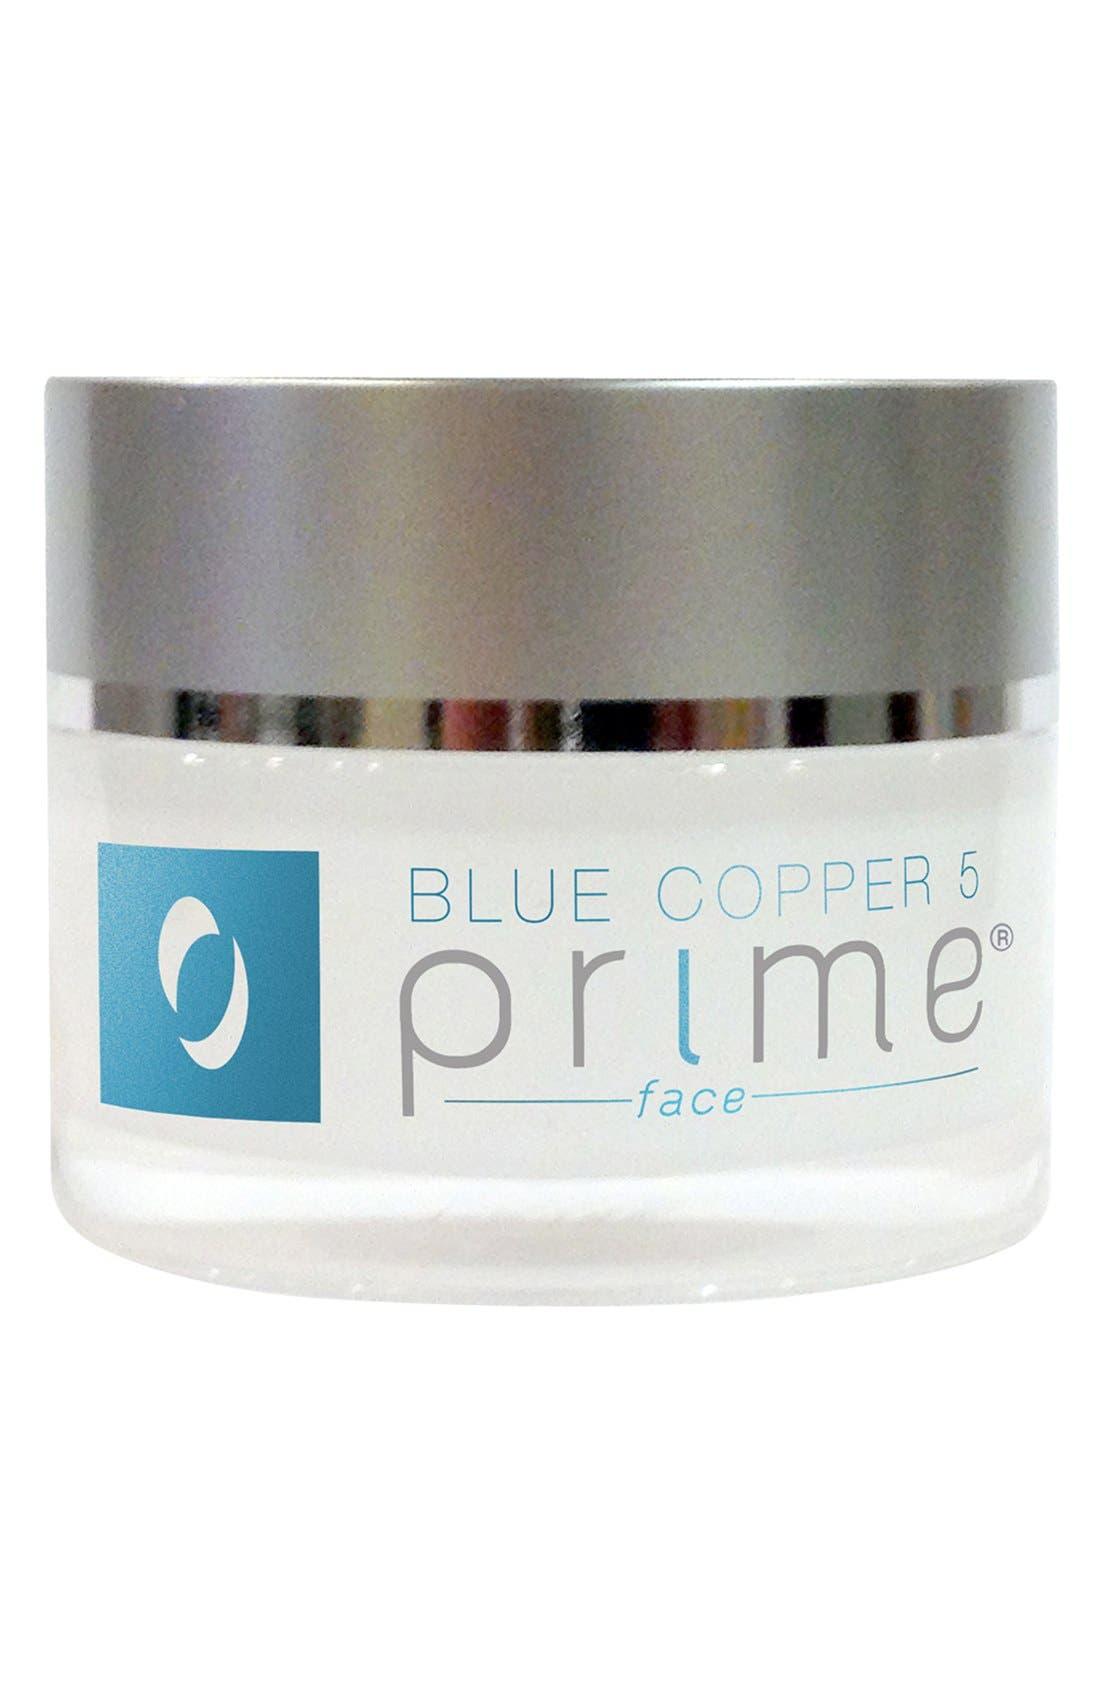 Blue Copper 5 Prime for Face,                         Main,                         color, NO COLOR